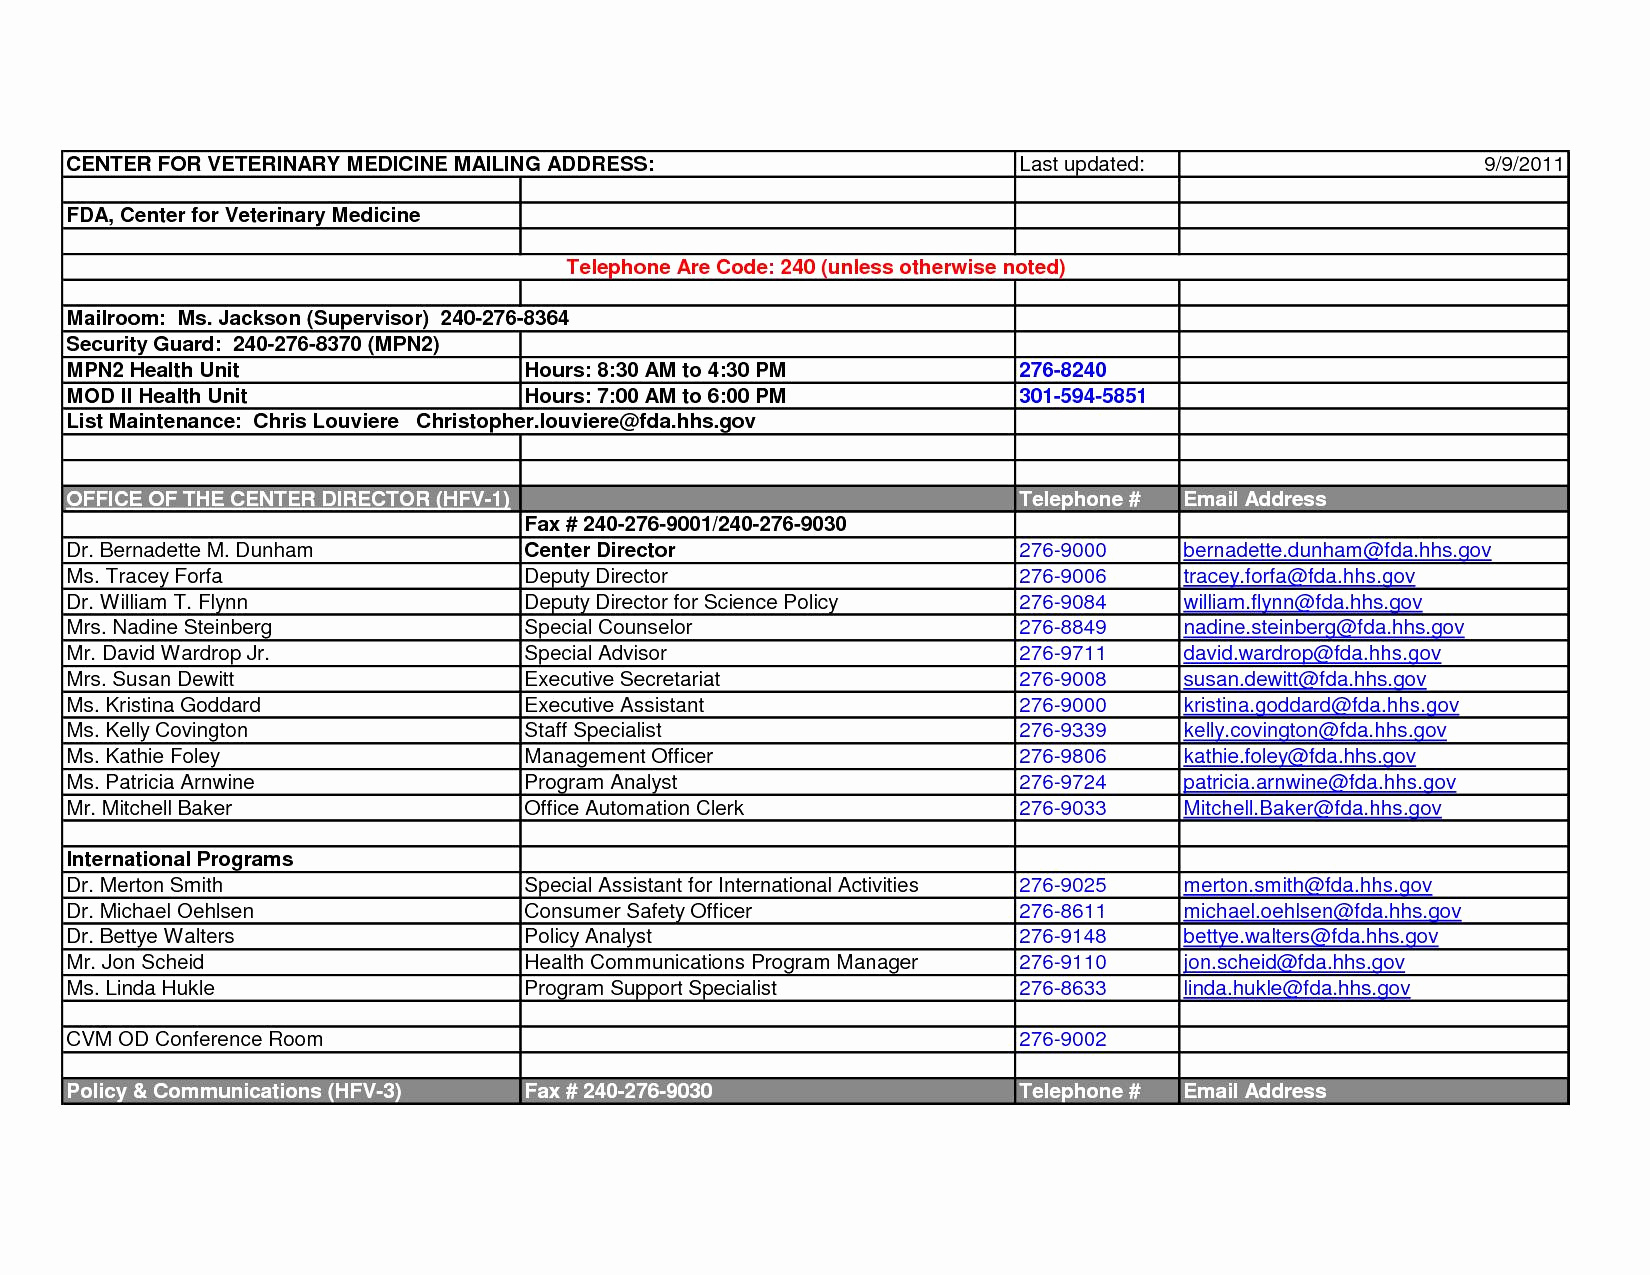 Roi Spreadsheet With Roi Spreadsheet – Spreadsheet Collections Roi Spreadsheet Printable Spreadshee Printable Spreadshee roi spreadsheet excel